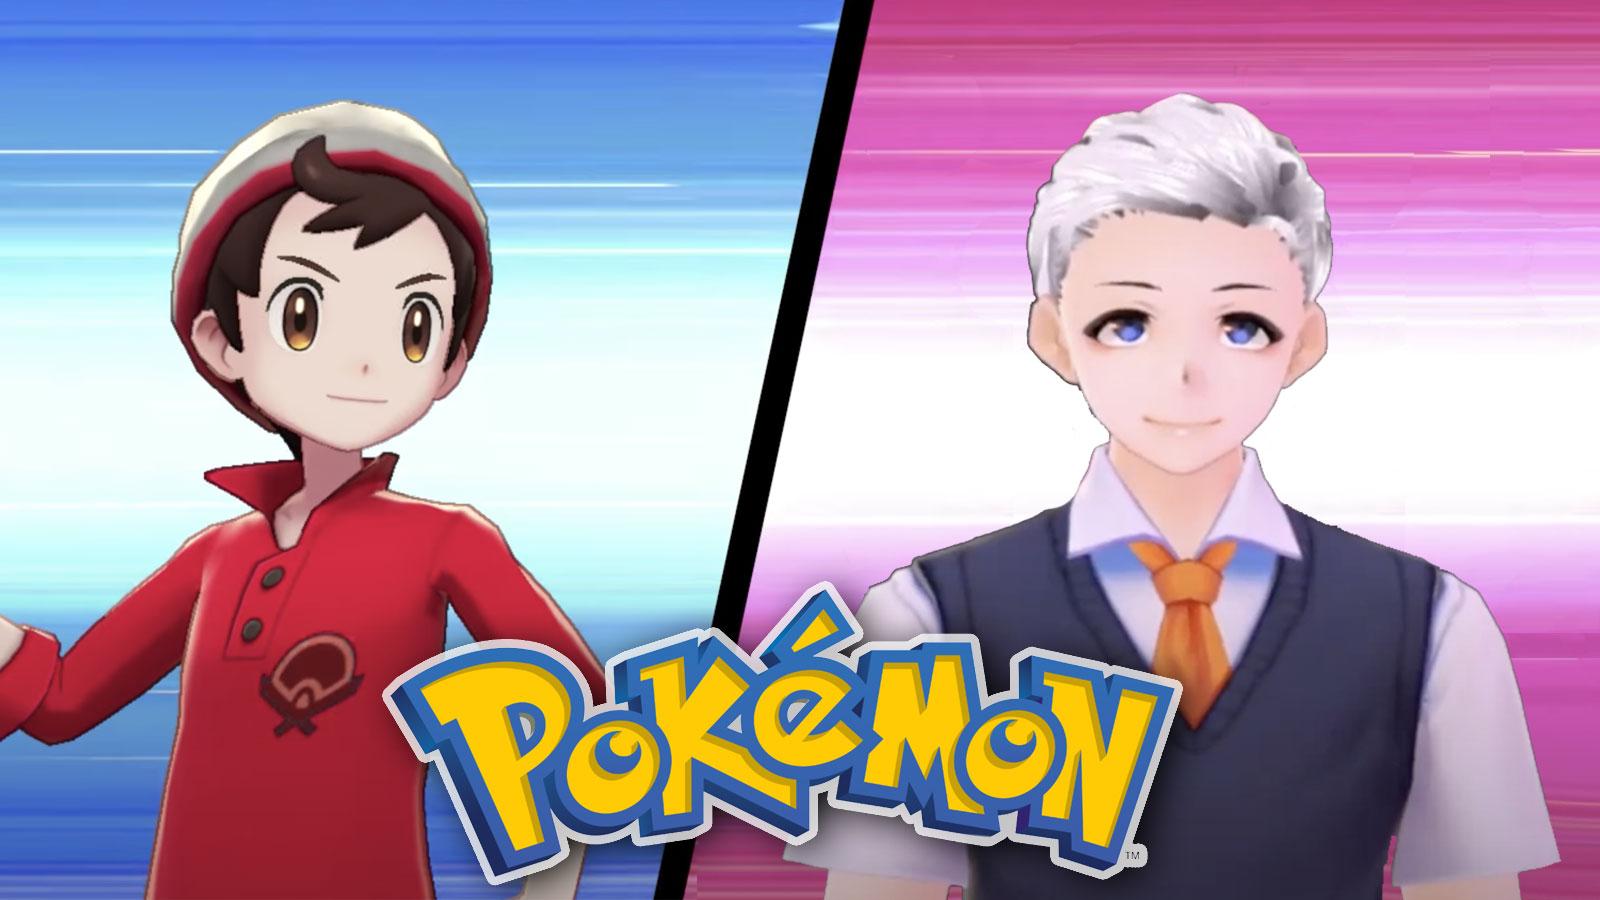 Screenshot of Pokemon Sword & Shield protagonist challenged by PewDiePie avatar.